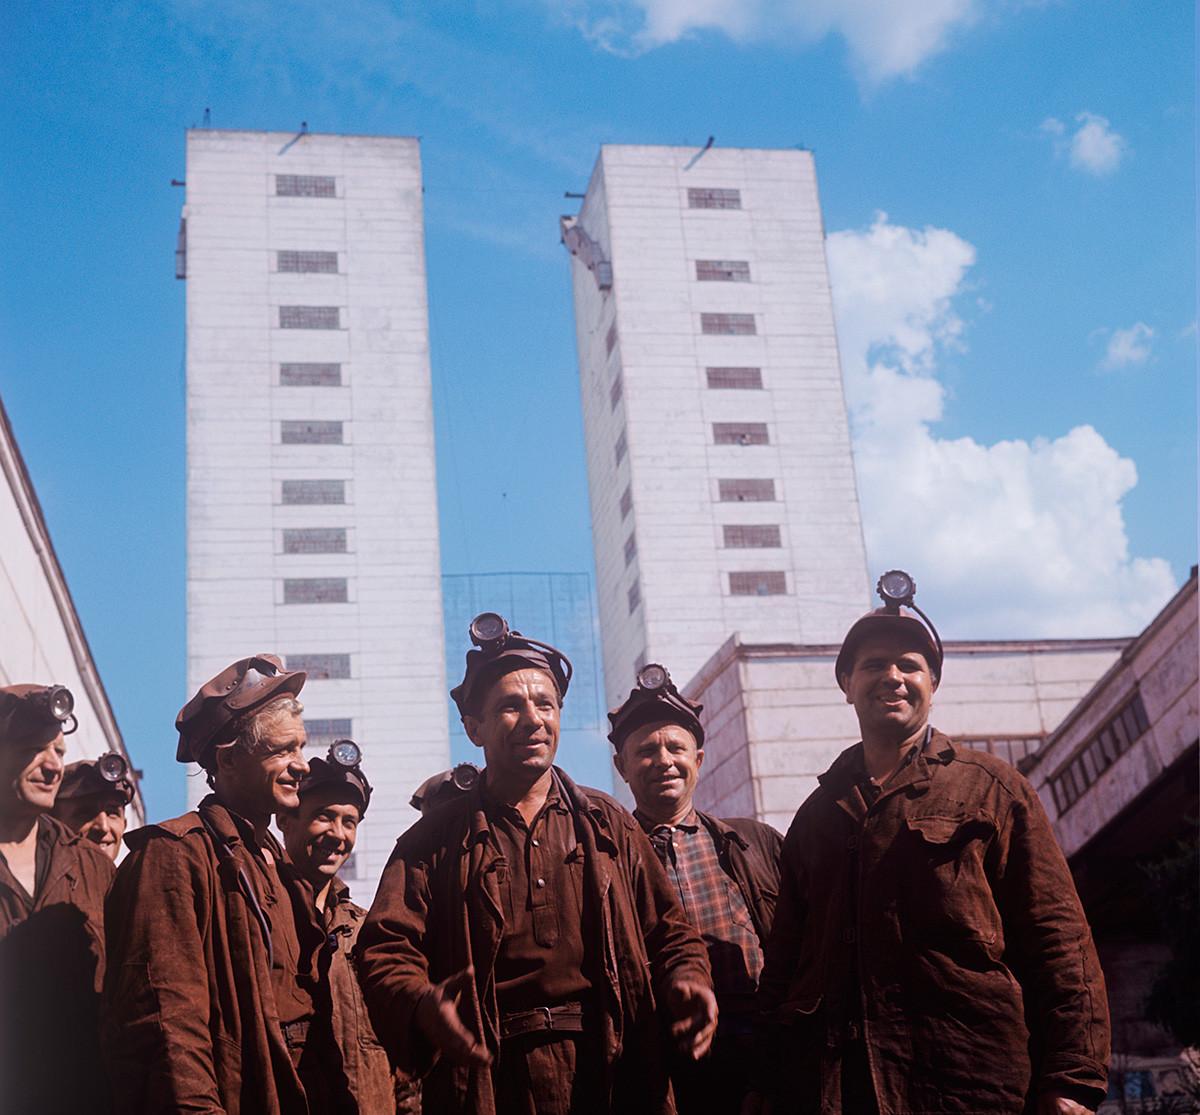 Mineiros em Gvardeiskaia, Krivoy Rog, 1970